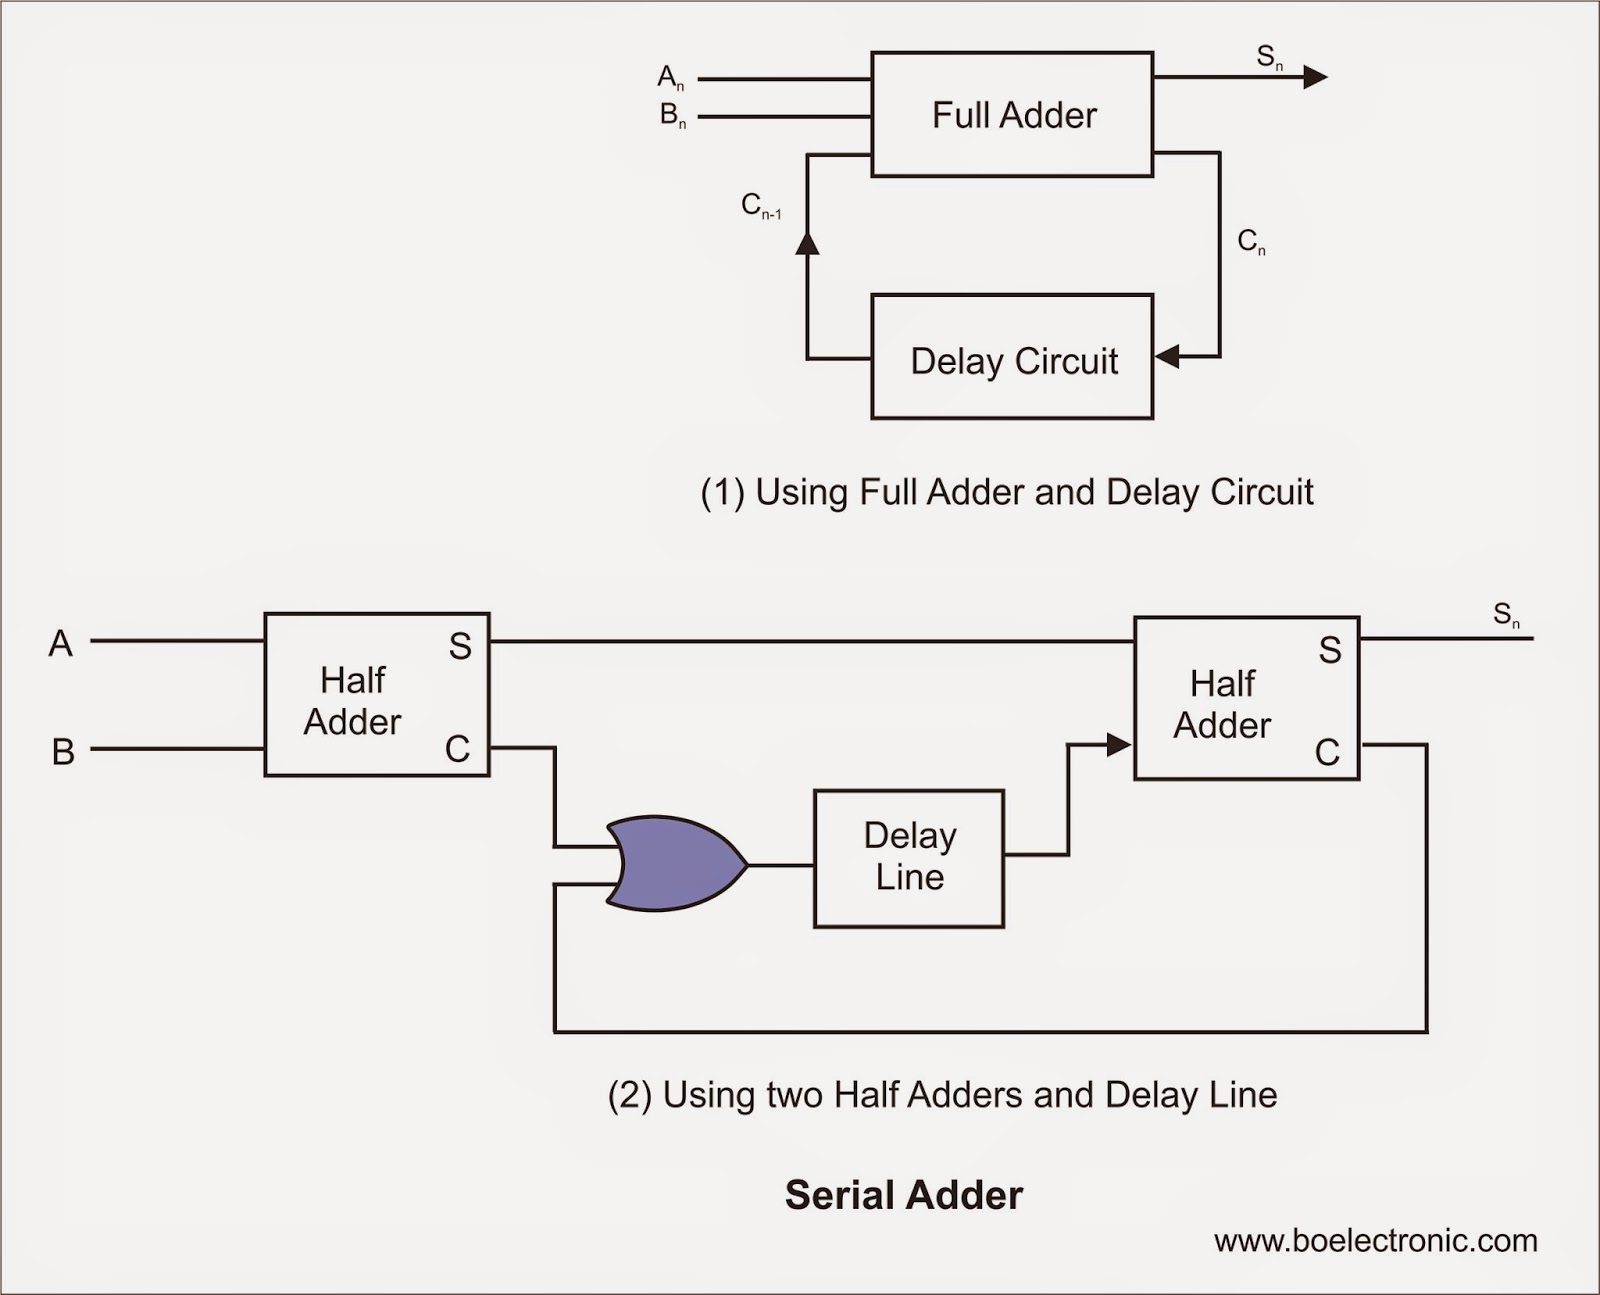 hight resolution of full adder block diagram photo 24